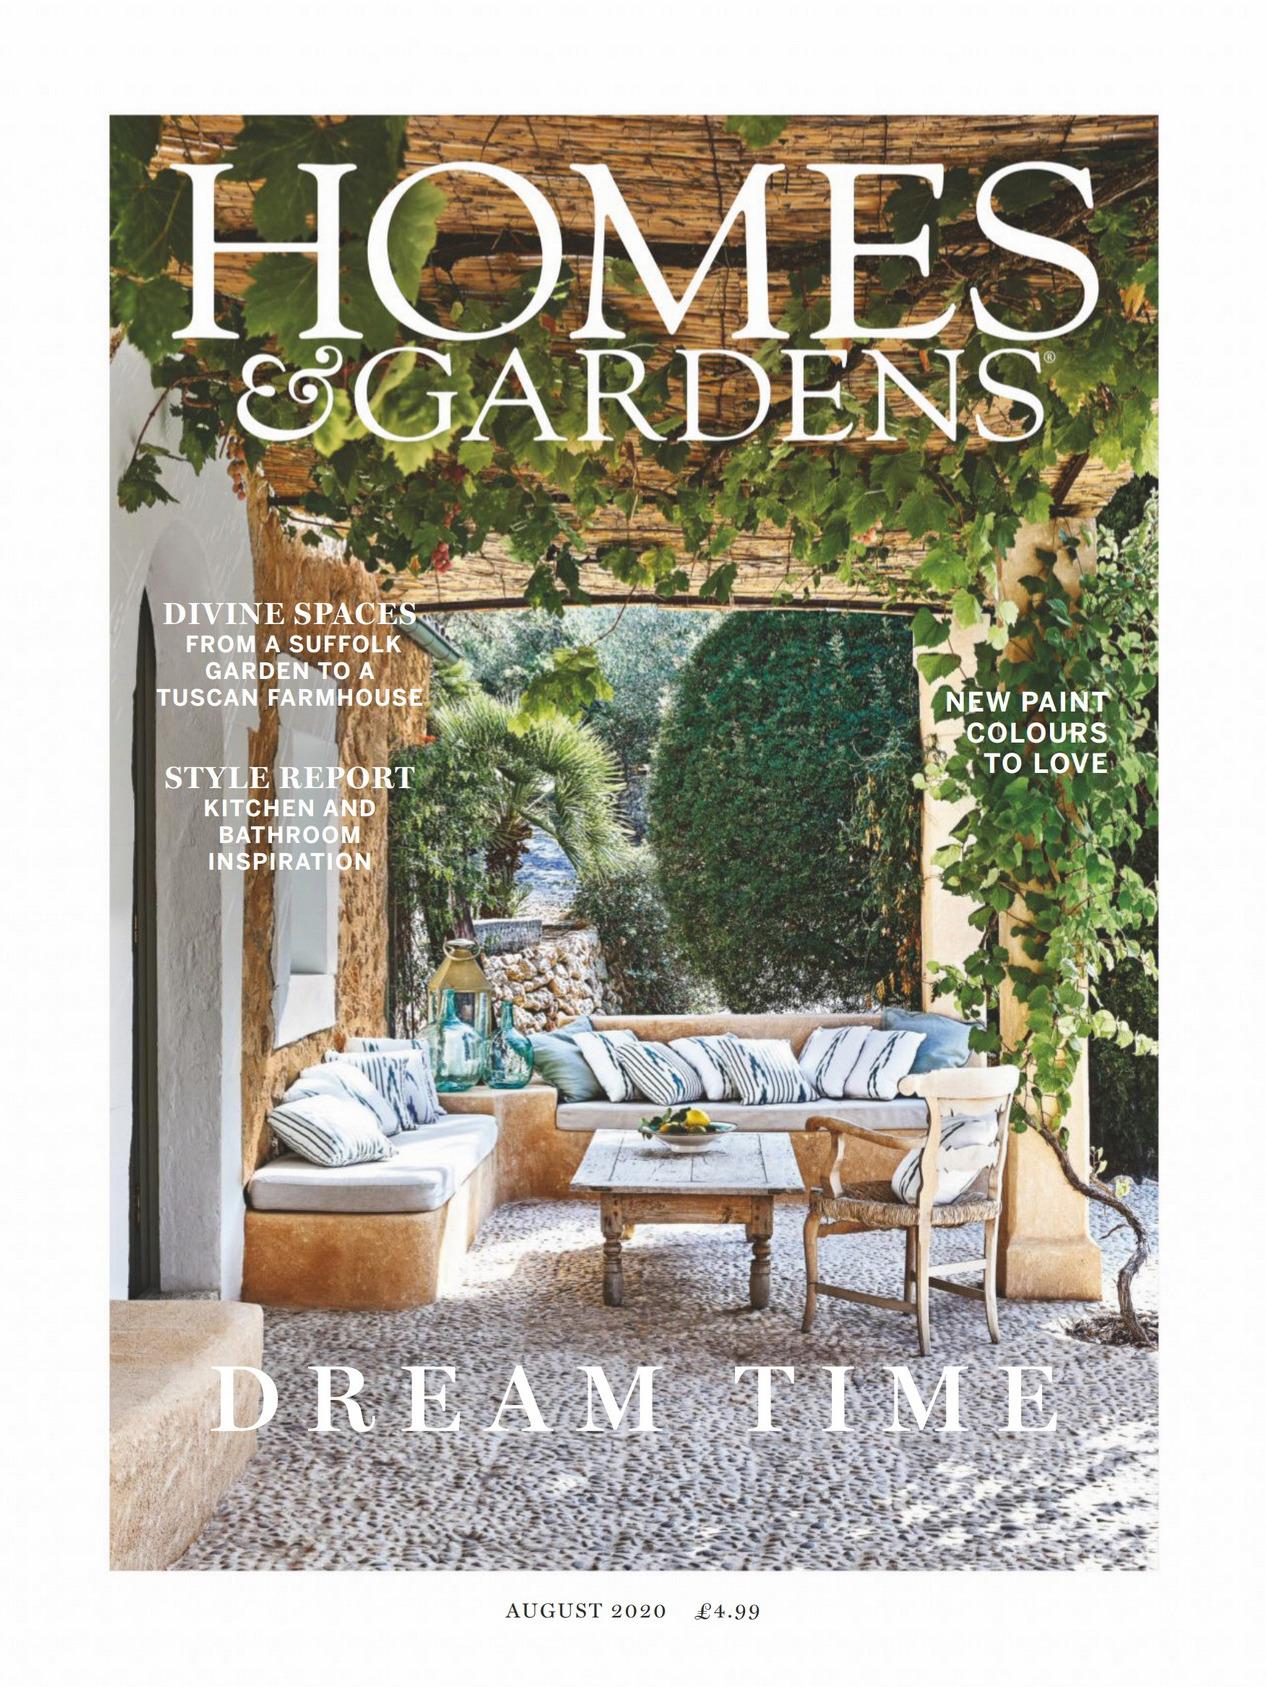 《Homes & Gardens》英国版时尚家居杂志2020年08月号